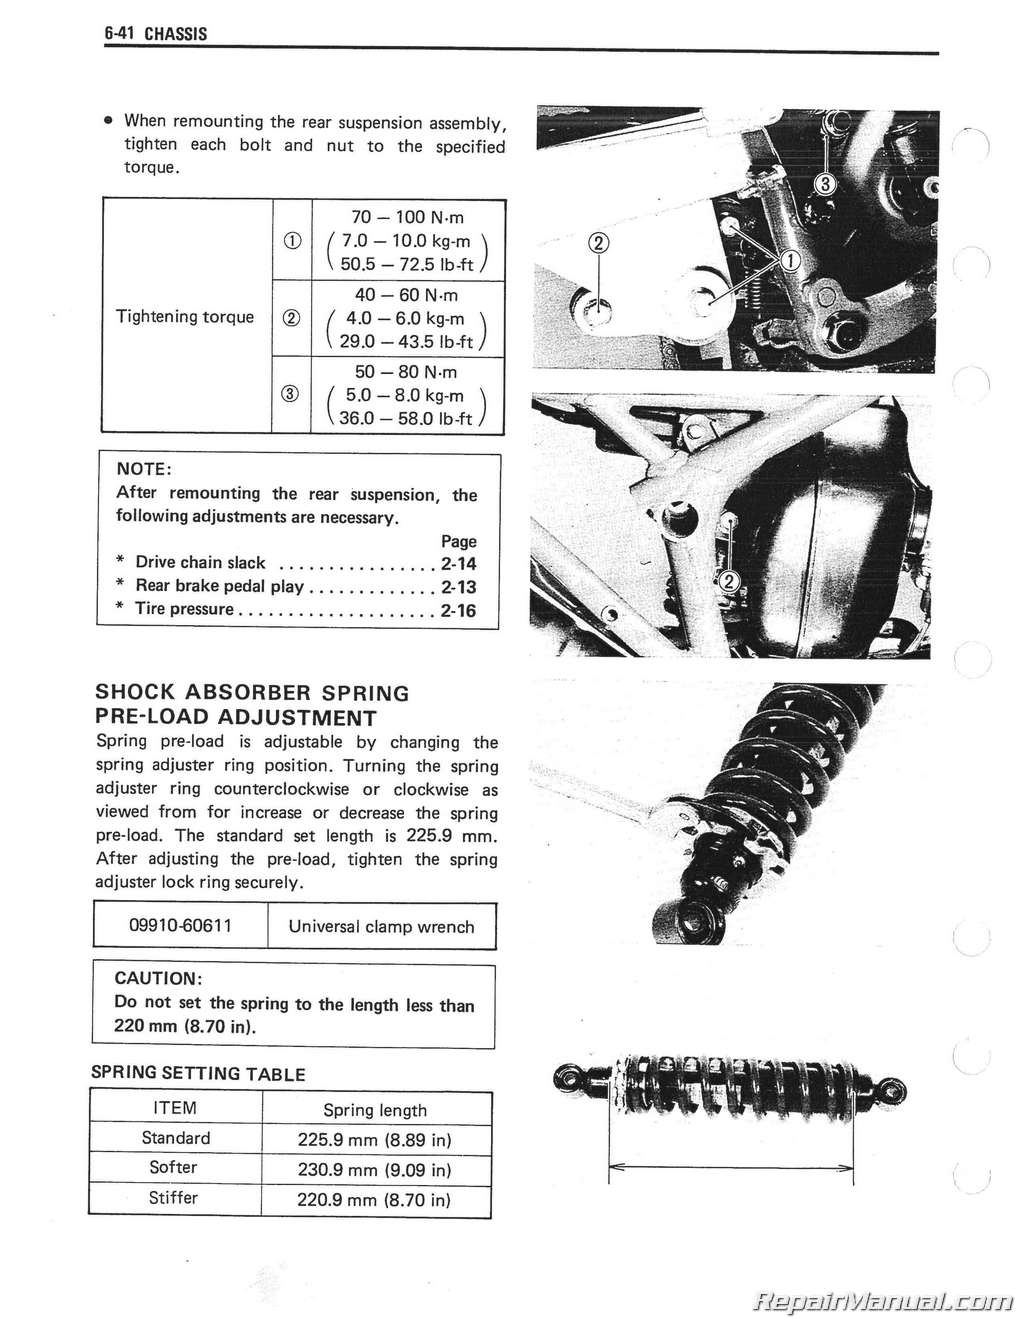 Sp 125 Wiring Diagram Suzuki Dr 500 1986 1987 1988 Dr125 Sp125 Motorcycle Service Manualsp 17